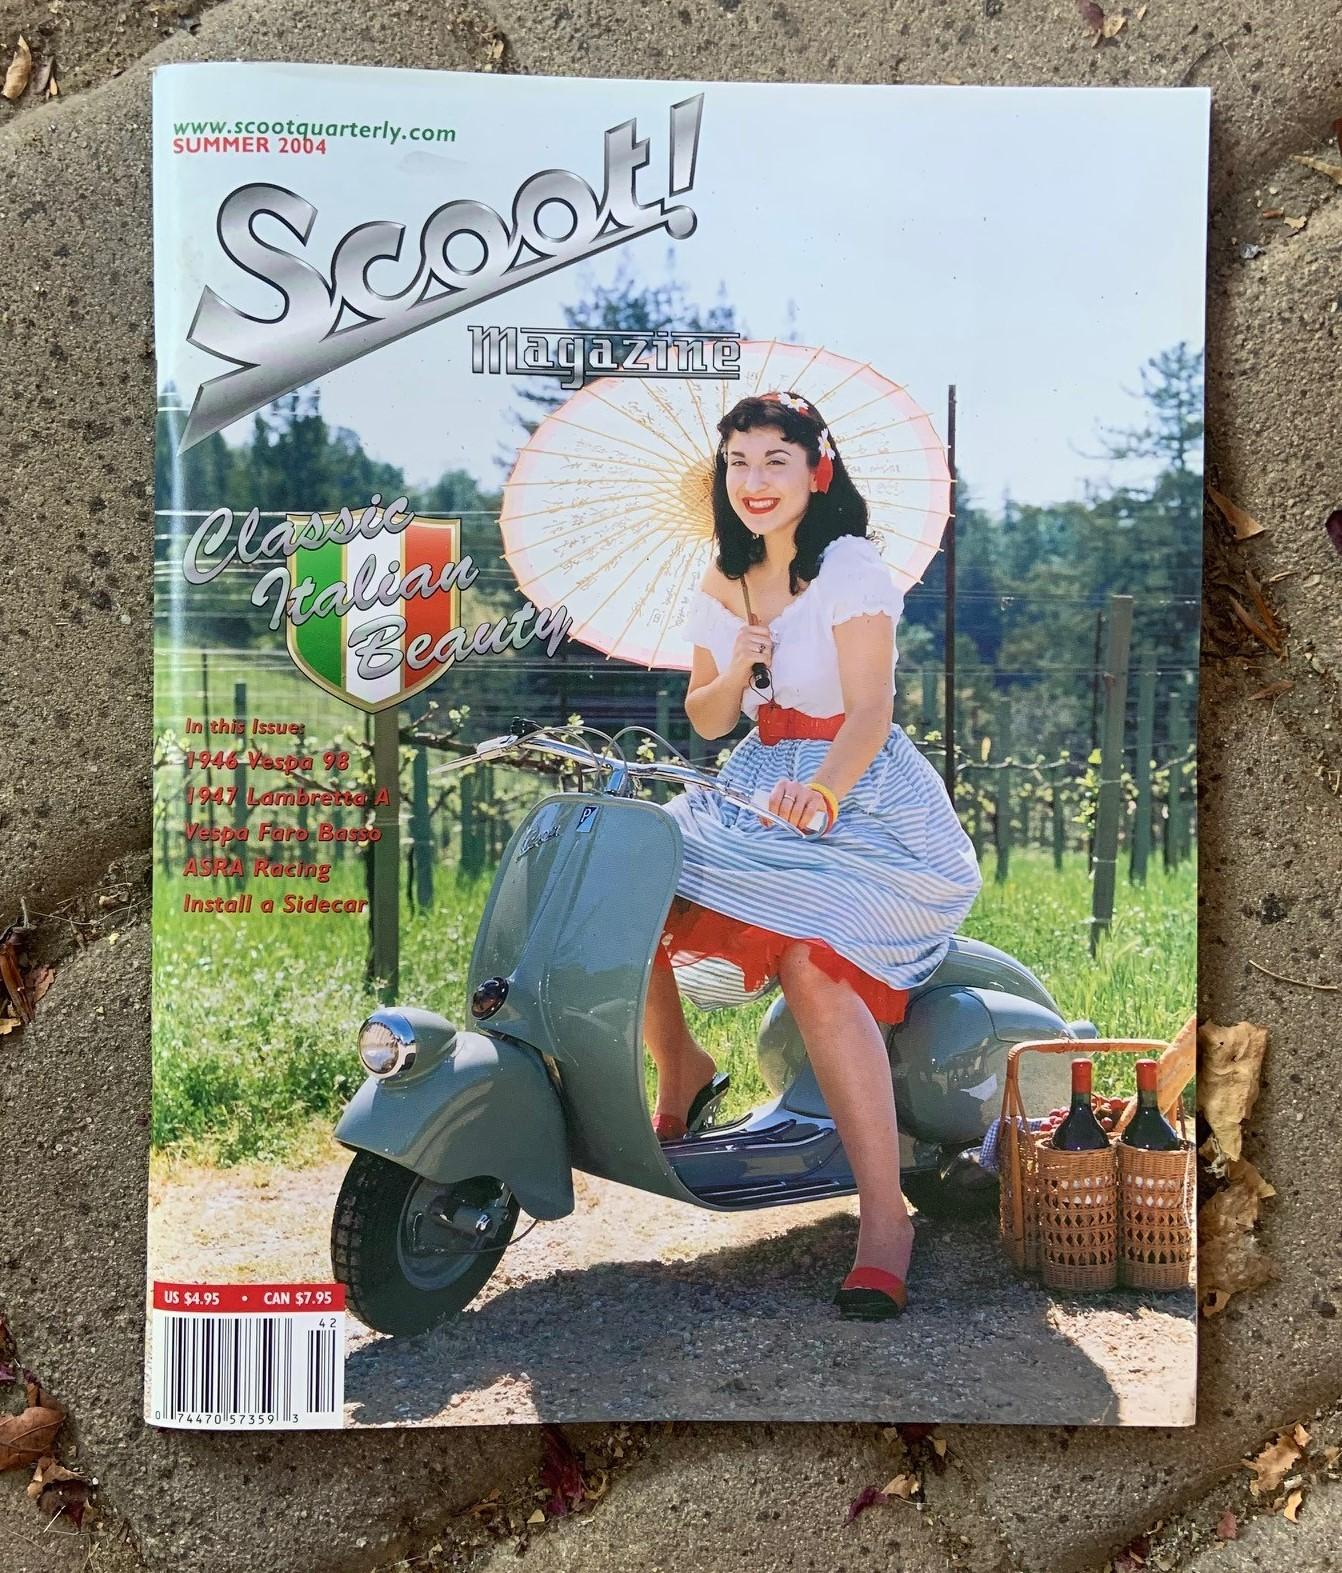 Josh Rogers - Cover of Scoot magazine 2004